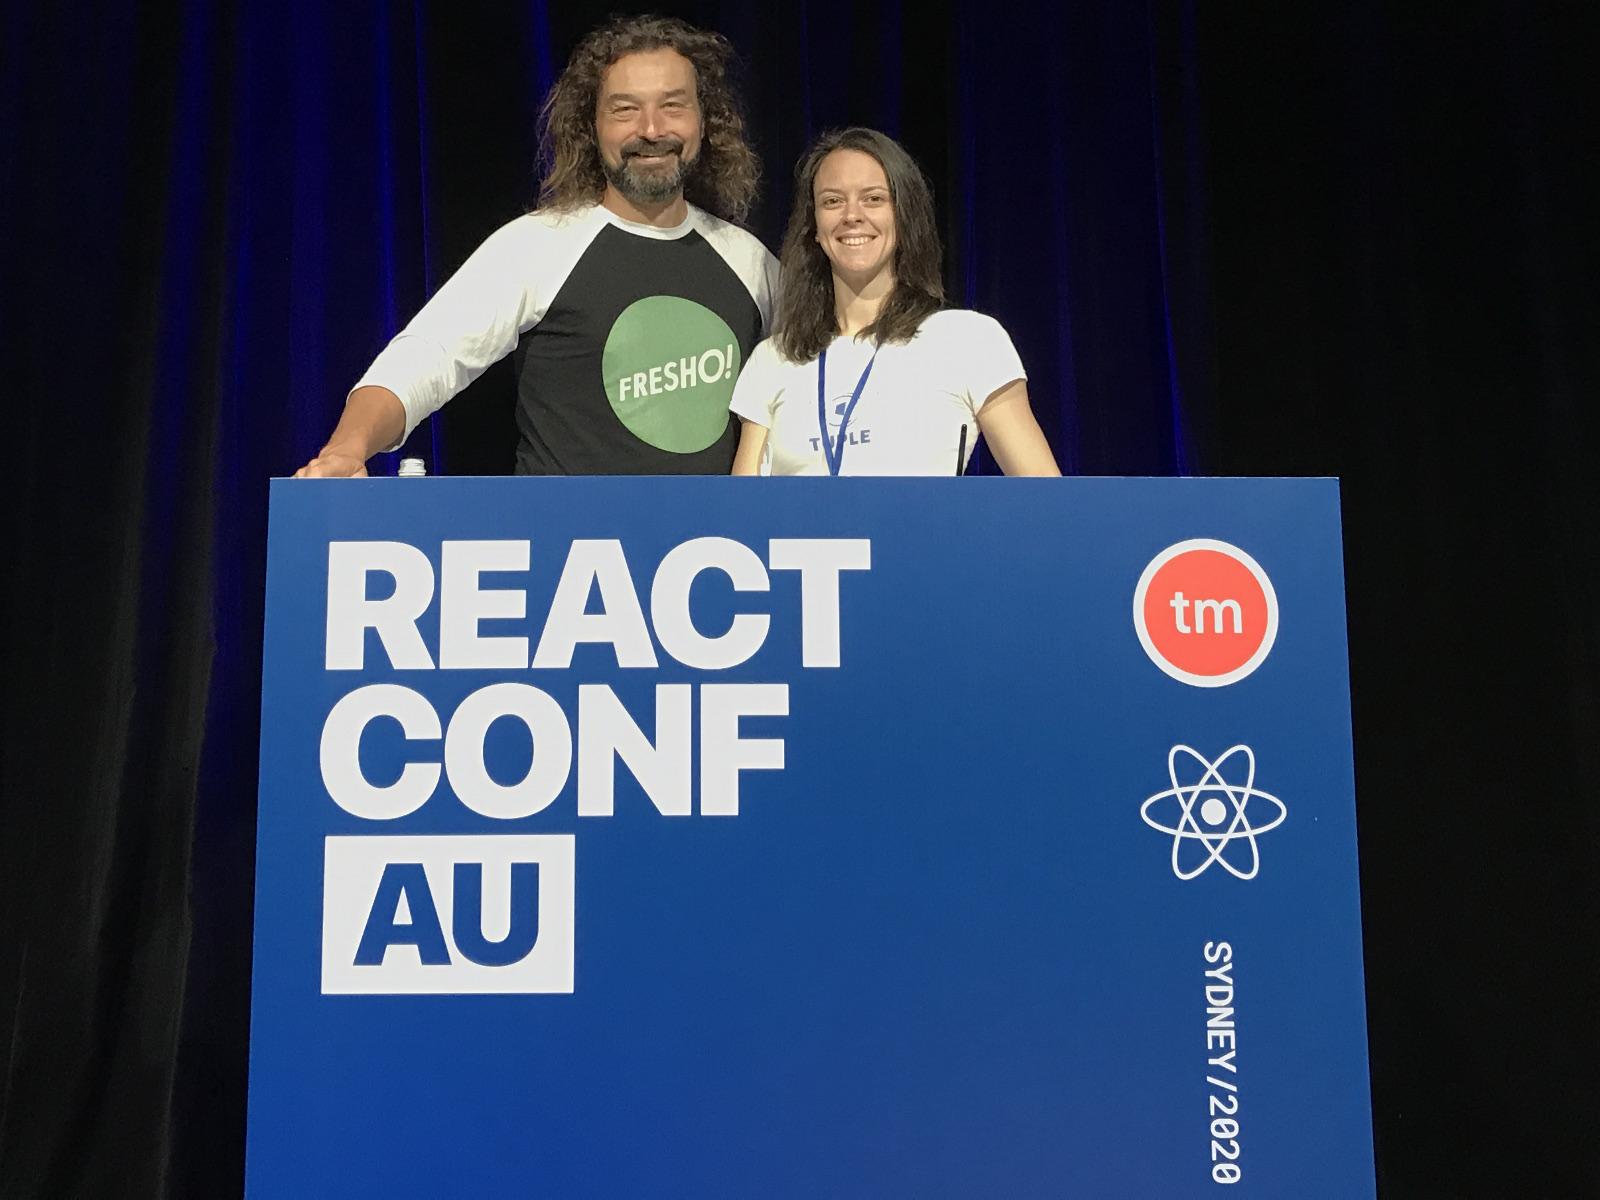 image from ReactConfAU 2020